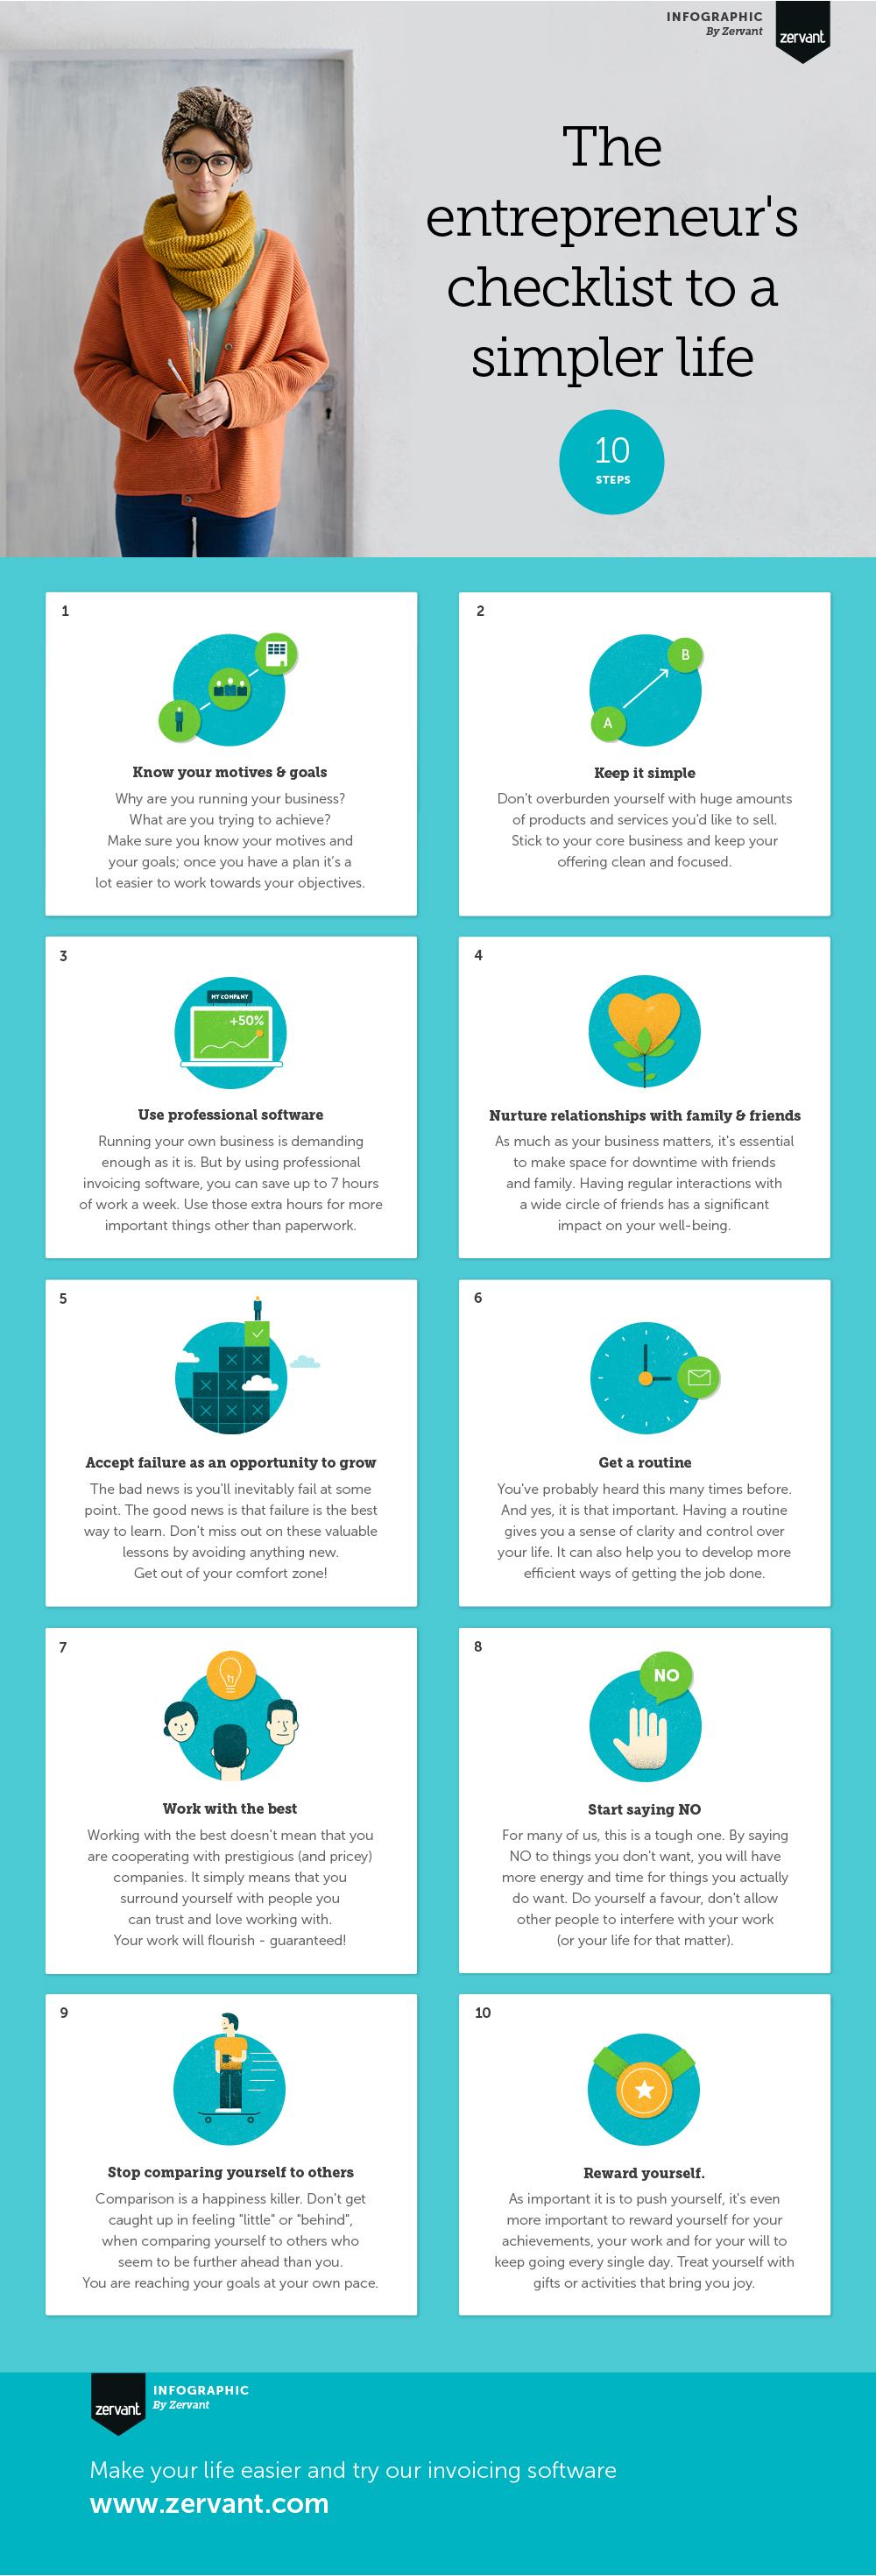 Entrepreneurs Checklist To A Simpler Life